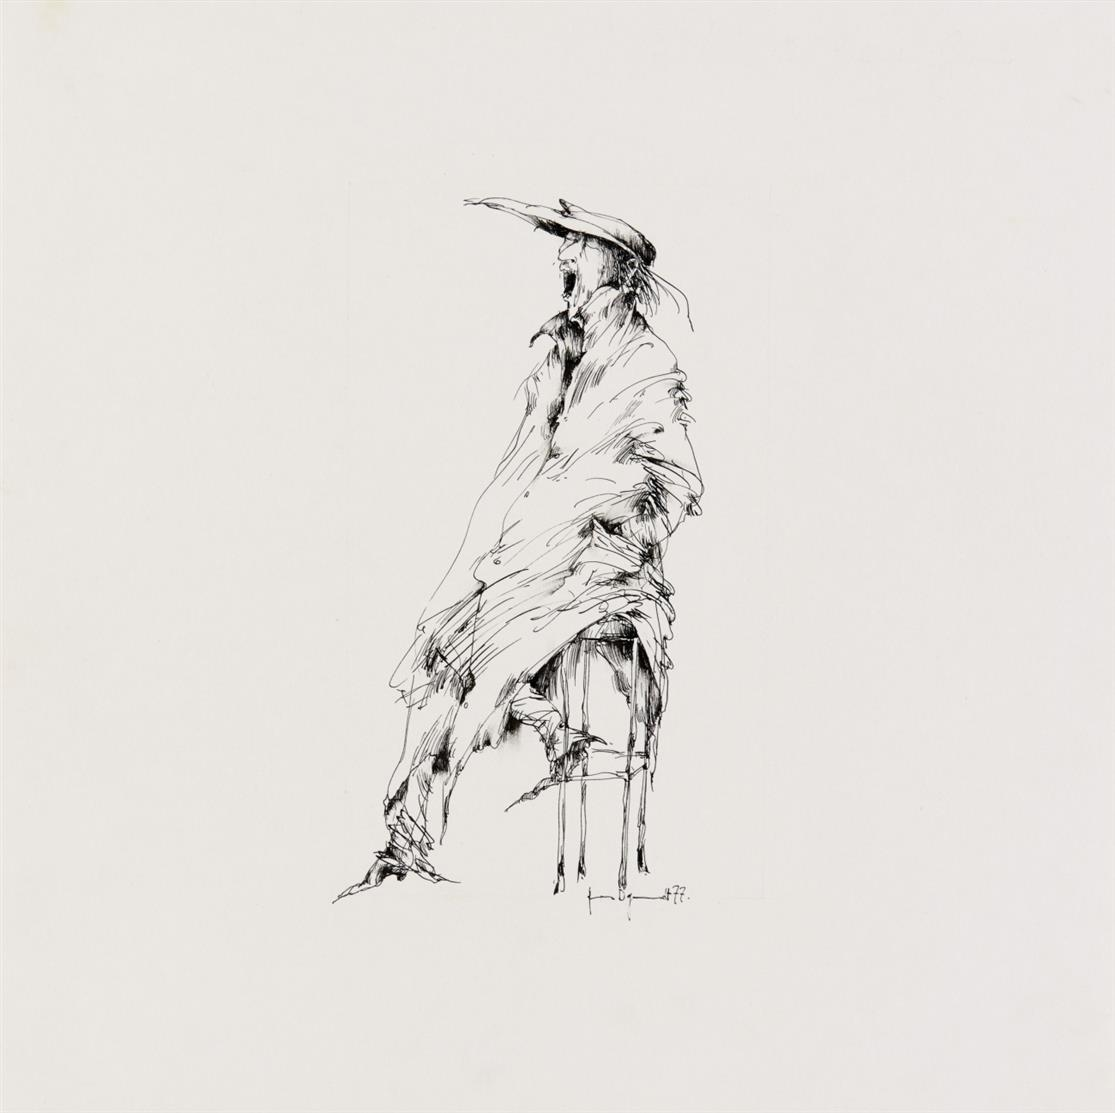 Gertrude Degenhardt. Figurenskizzen. 1977. 3 Blatt Federzeichnungen. Signiert.